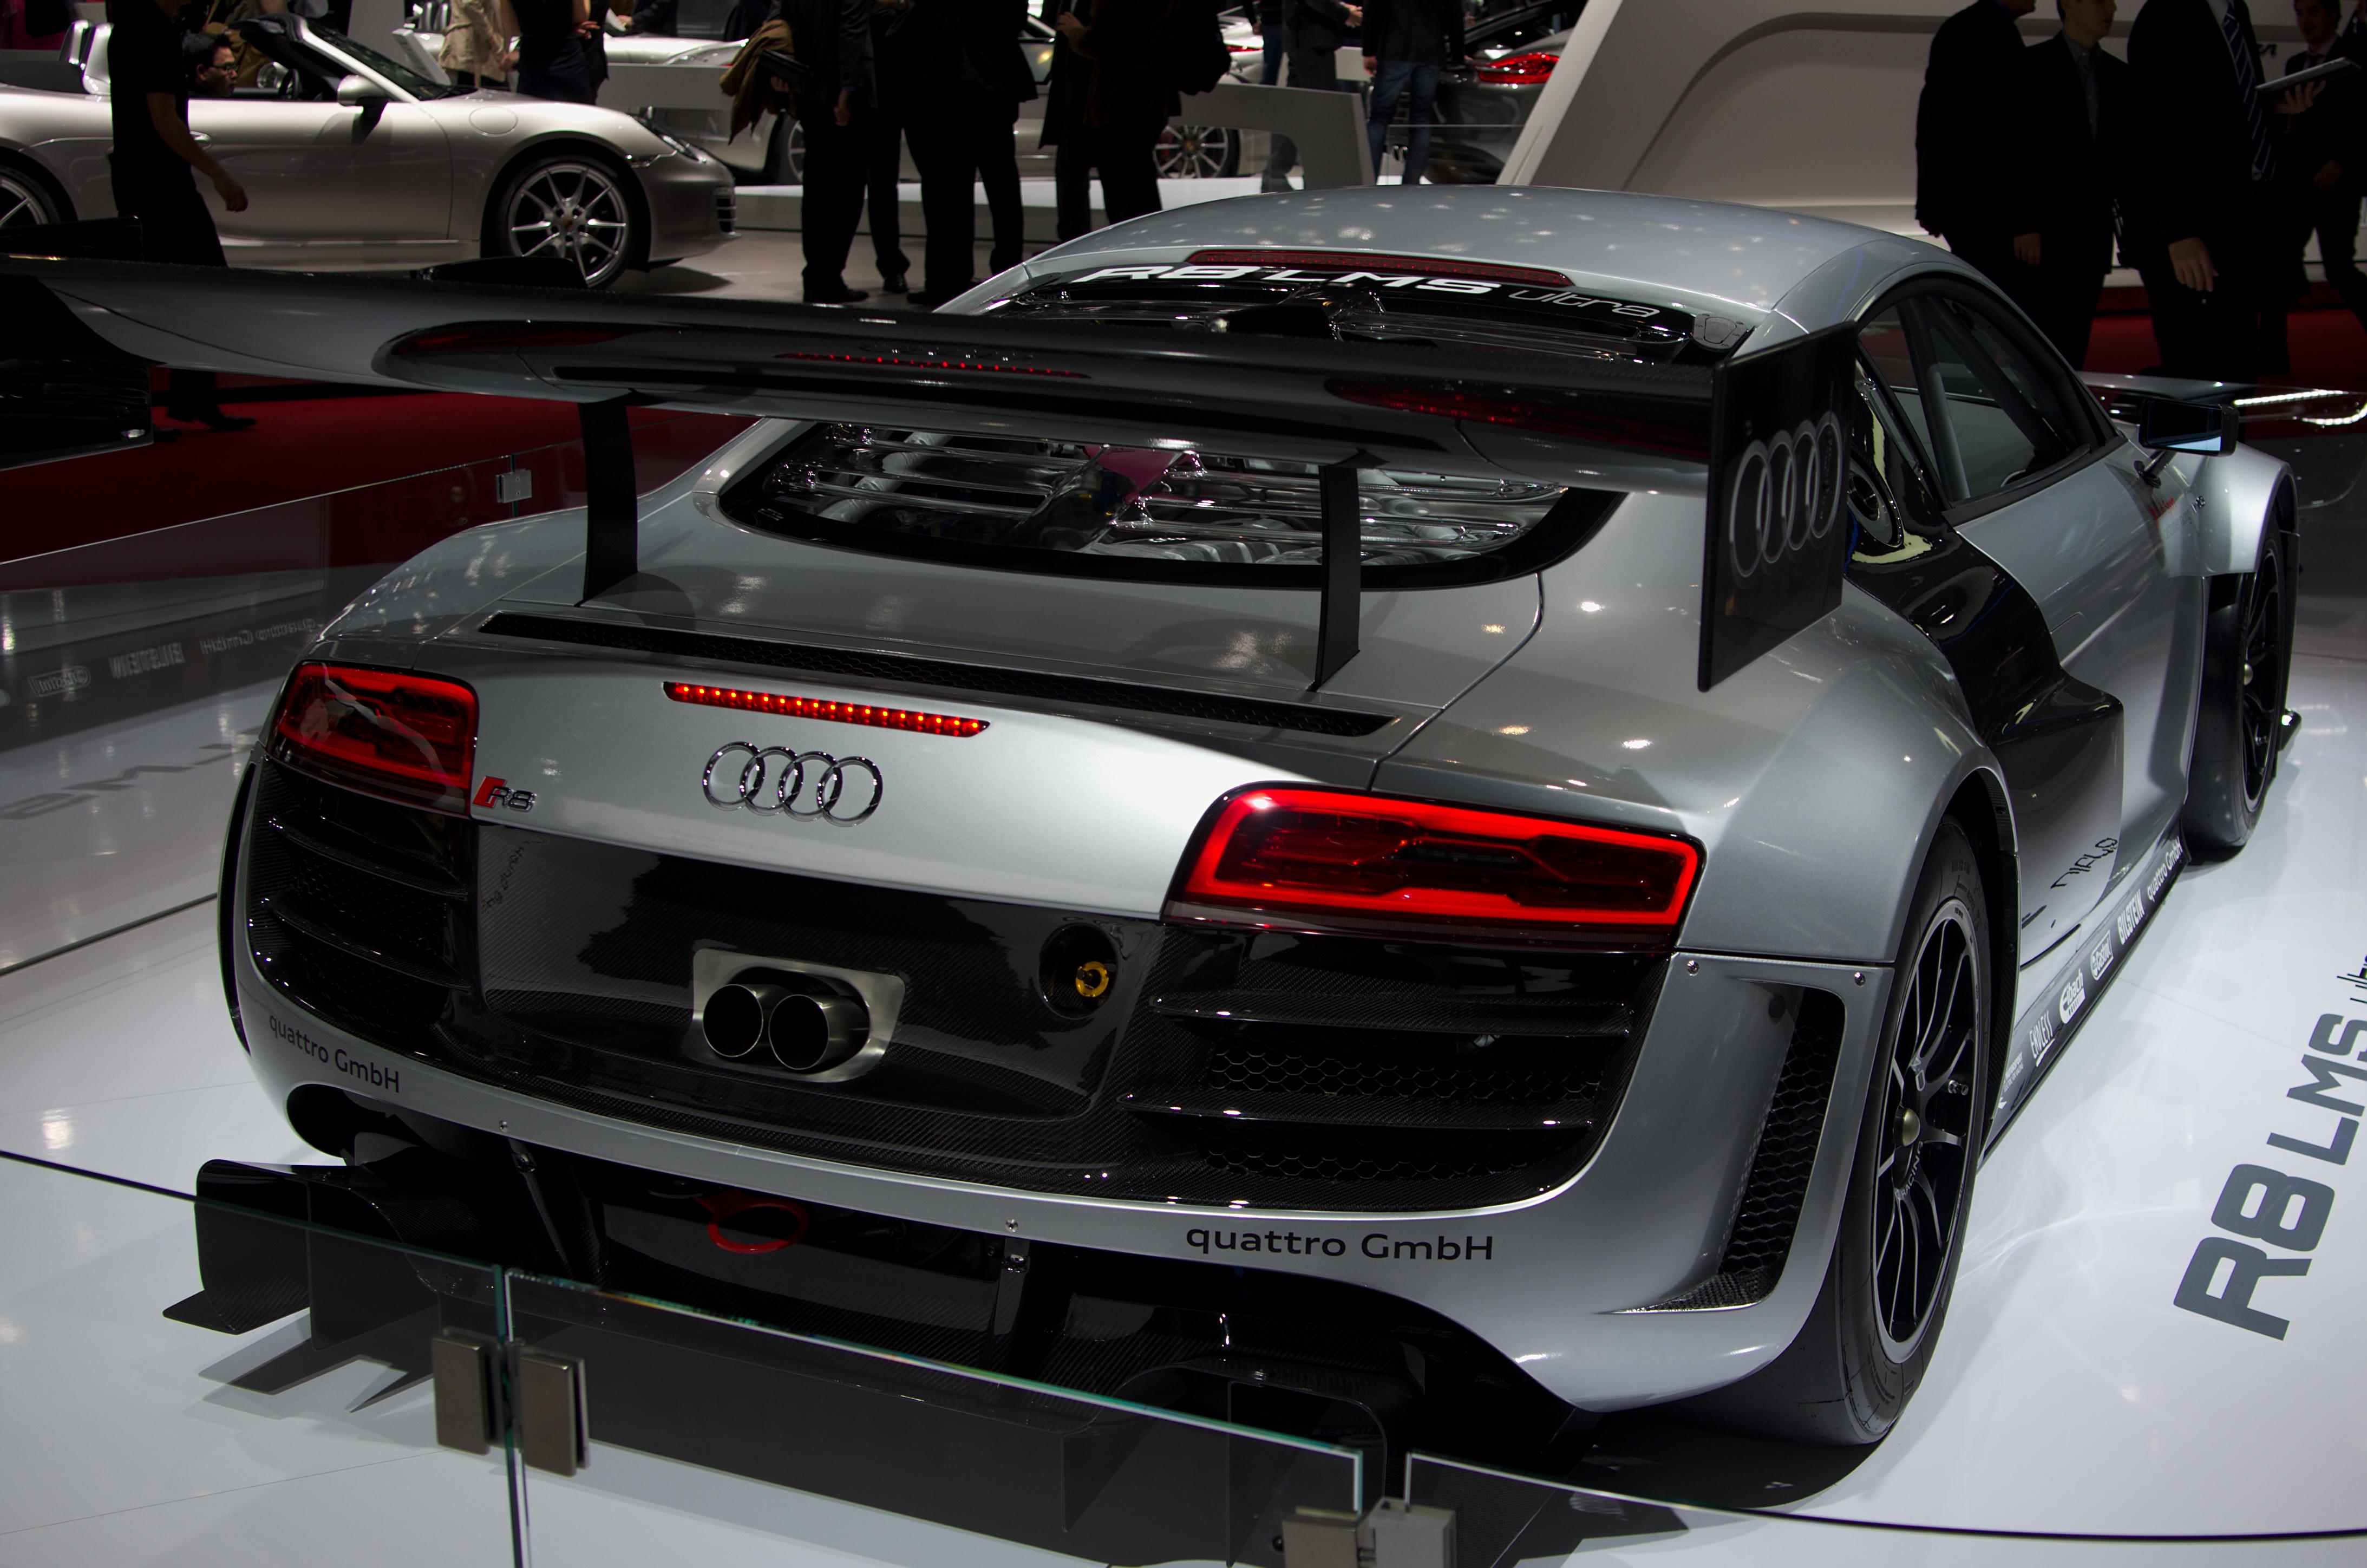 Description Geneva MotorShow 2013 - Audi R8 LMS ultra rear view.jpg